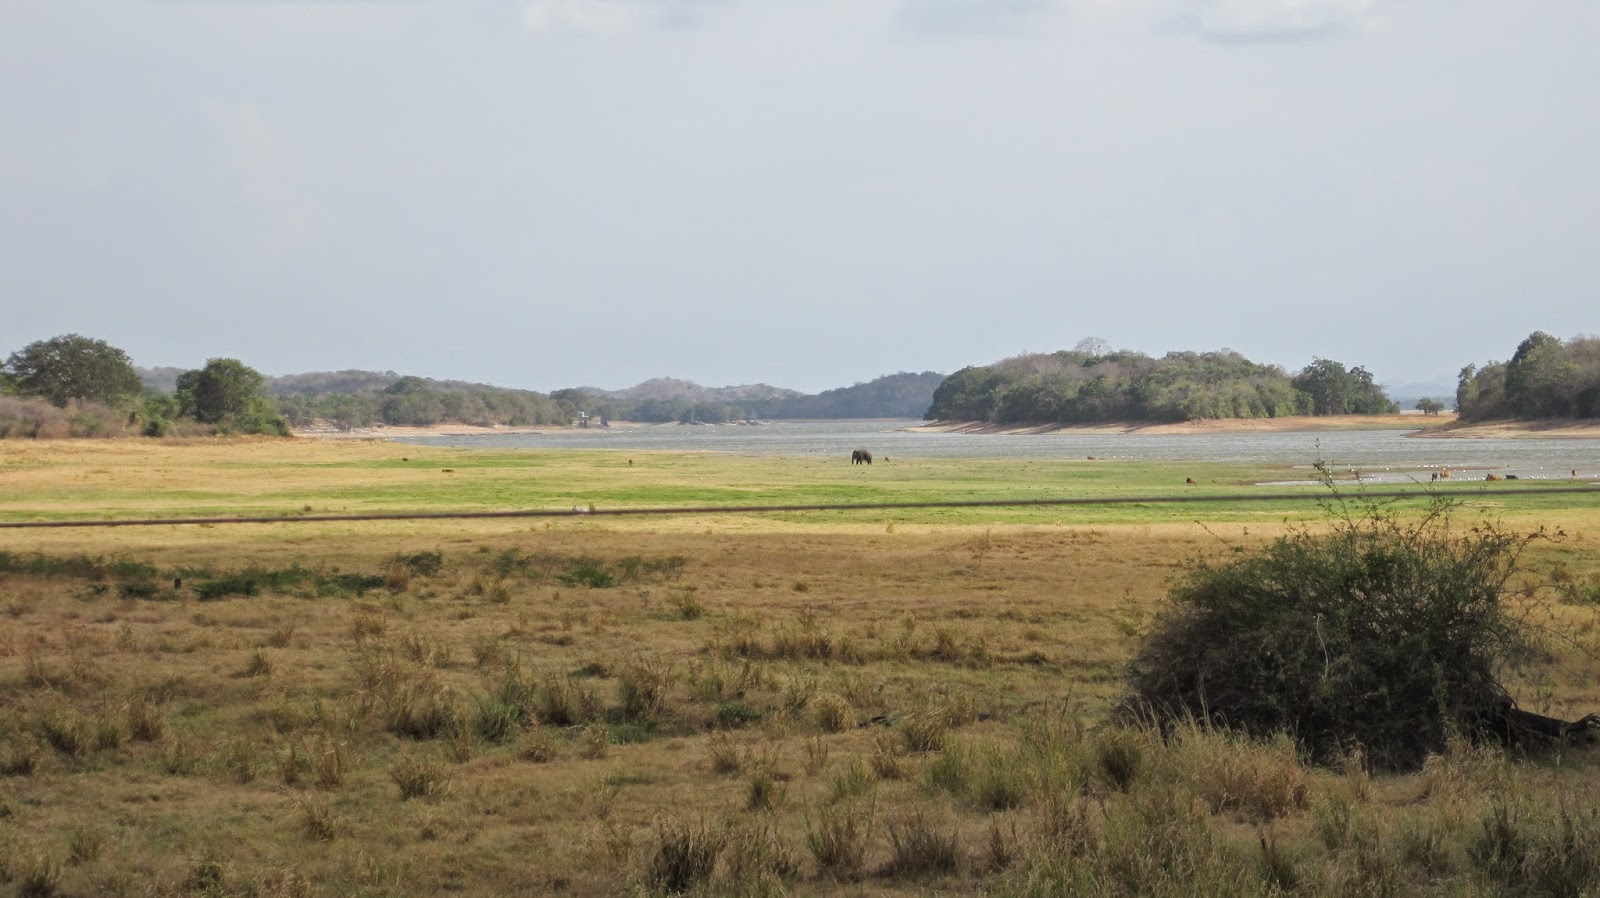 Parque Nacional de Minneriya (Sri Lanka)